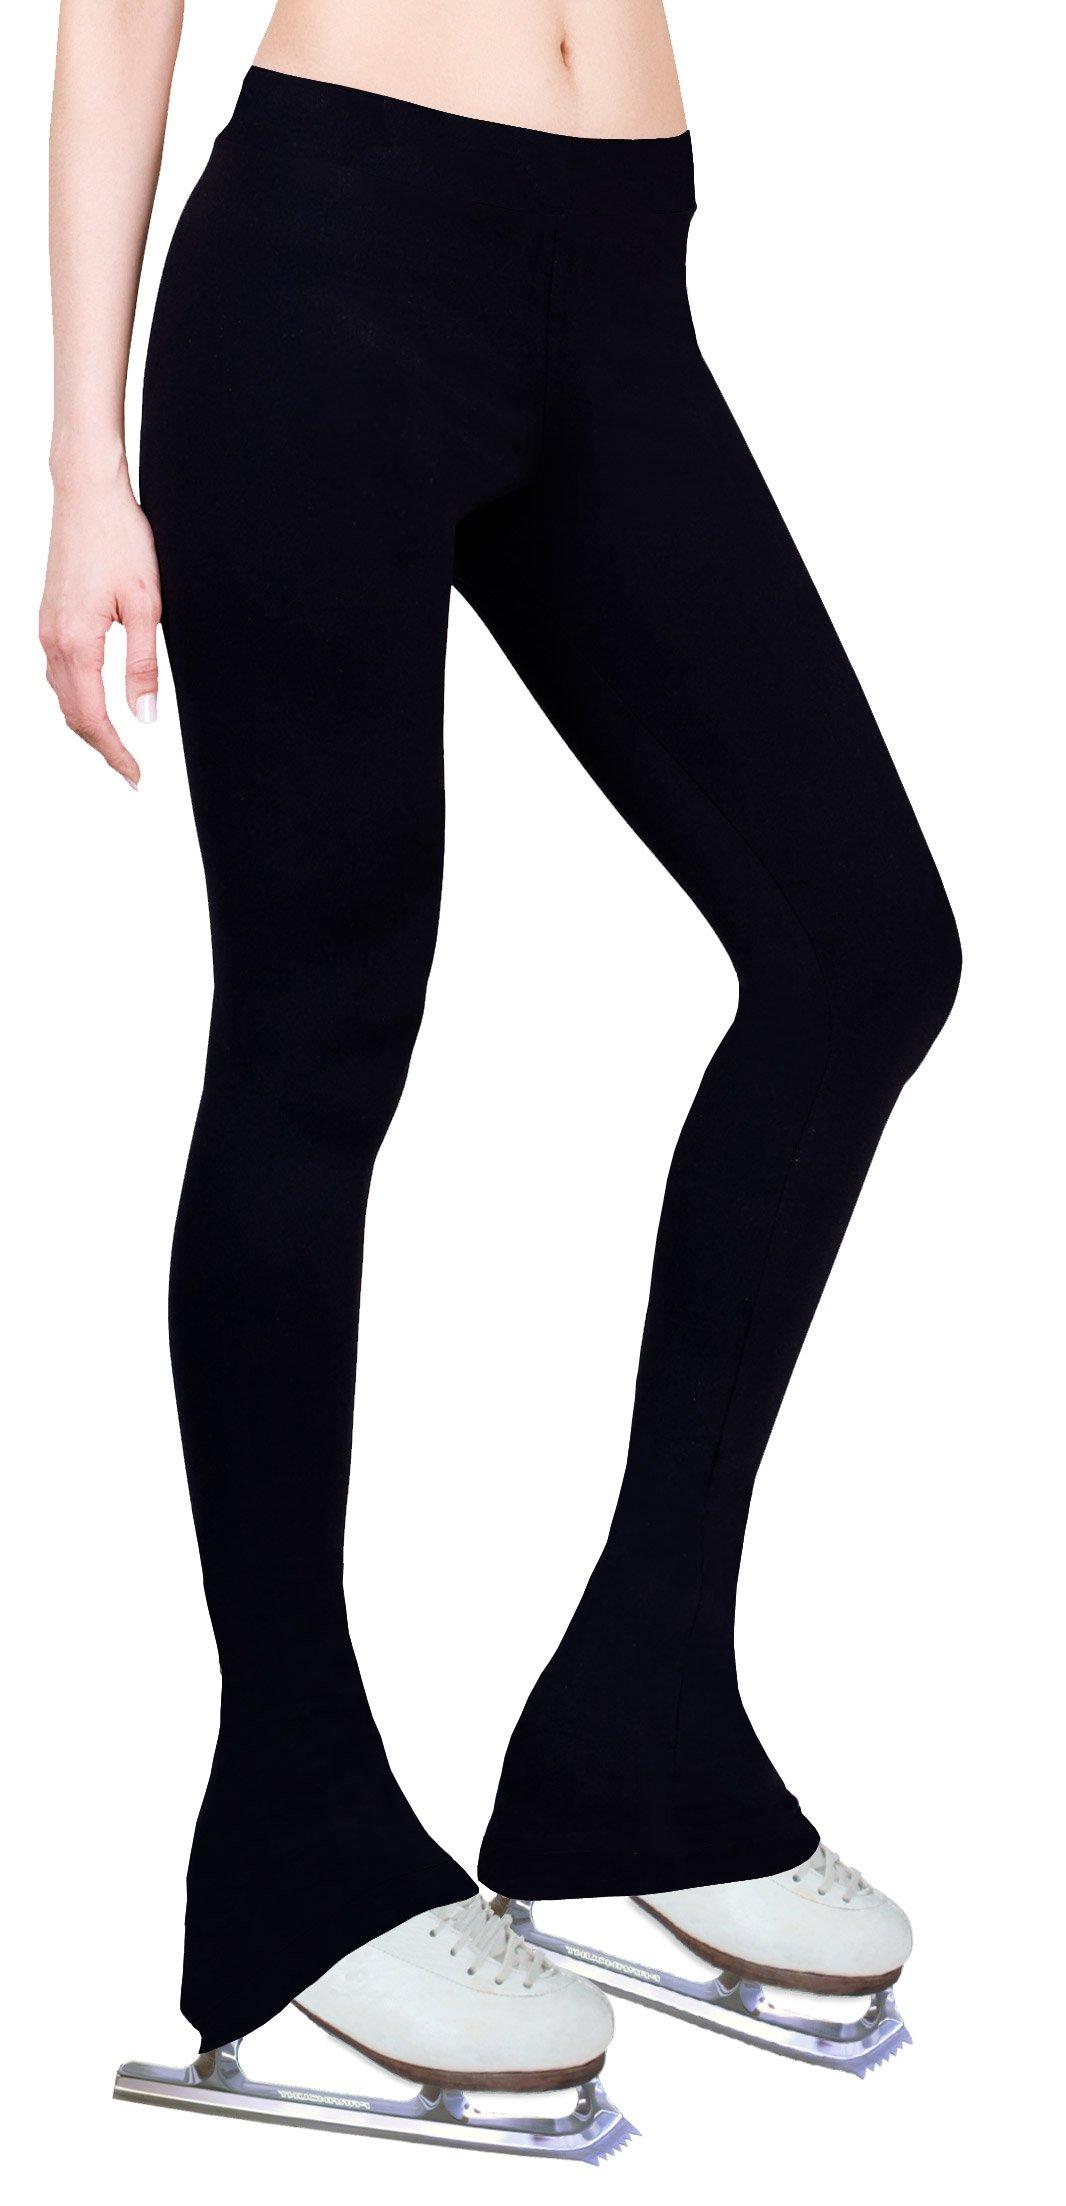 ny2 Sportswear Figure Skating Polartec Polar Fleece Pants PF200BK (Black, Adult Extra Small)